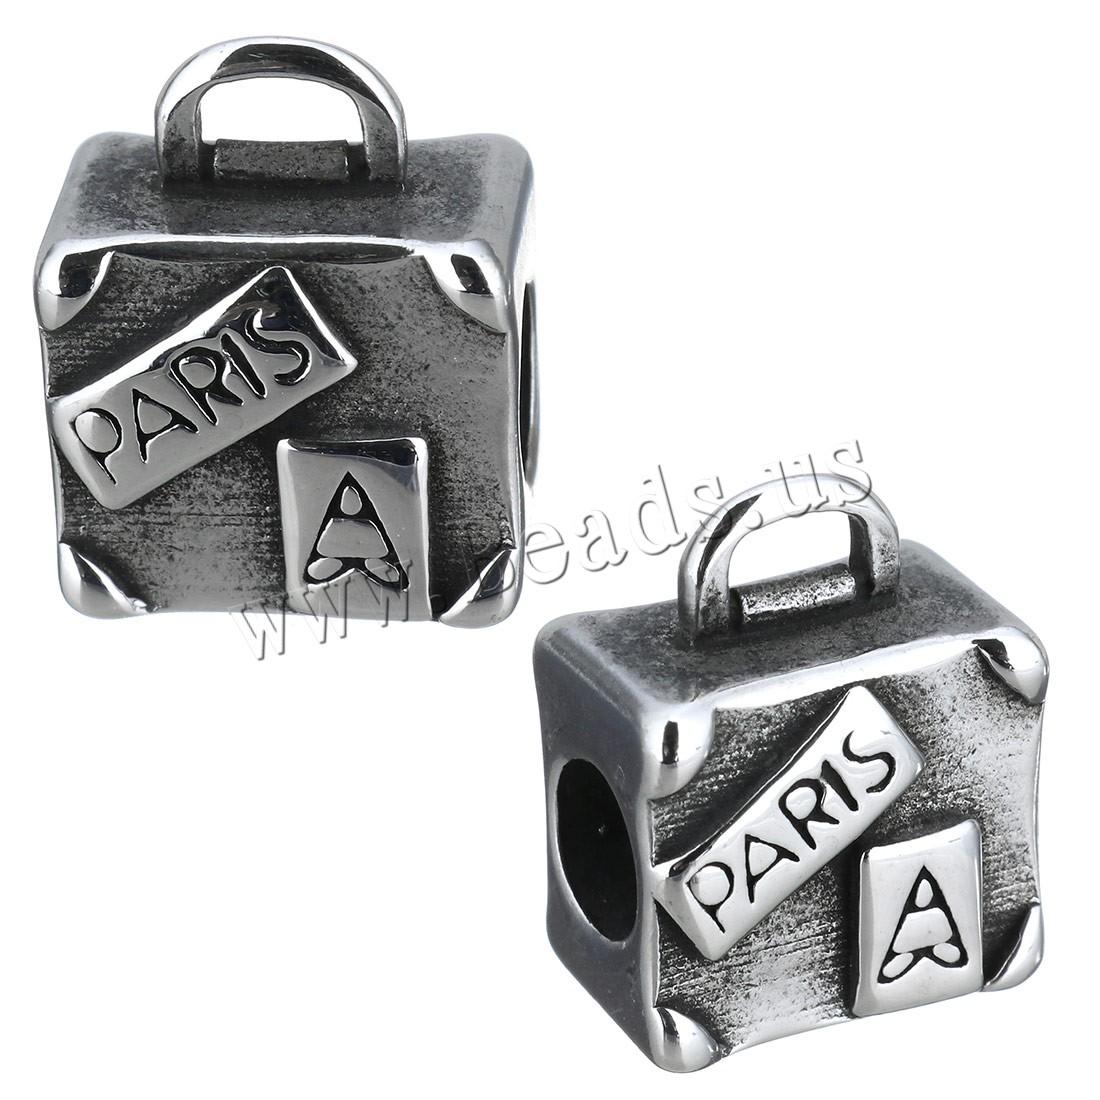 Buy Stainless Steel Bail Beads Handbag letter pattern & blacken 12x15x8mm Hole:Approx 5mm 4x2mm 1 Sold Lot